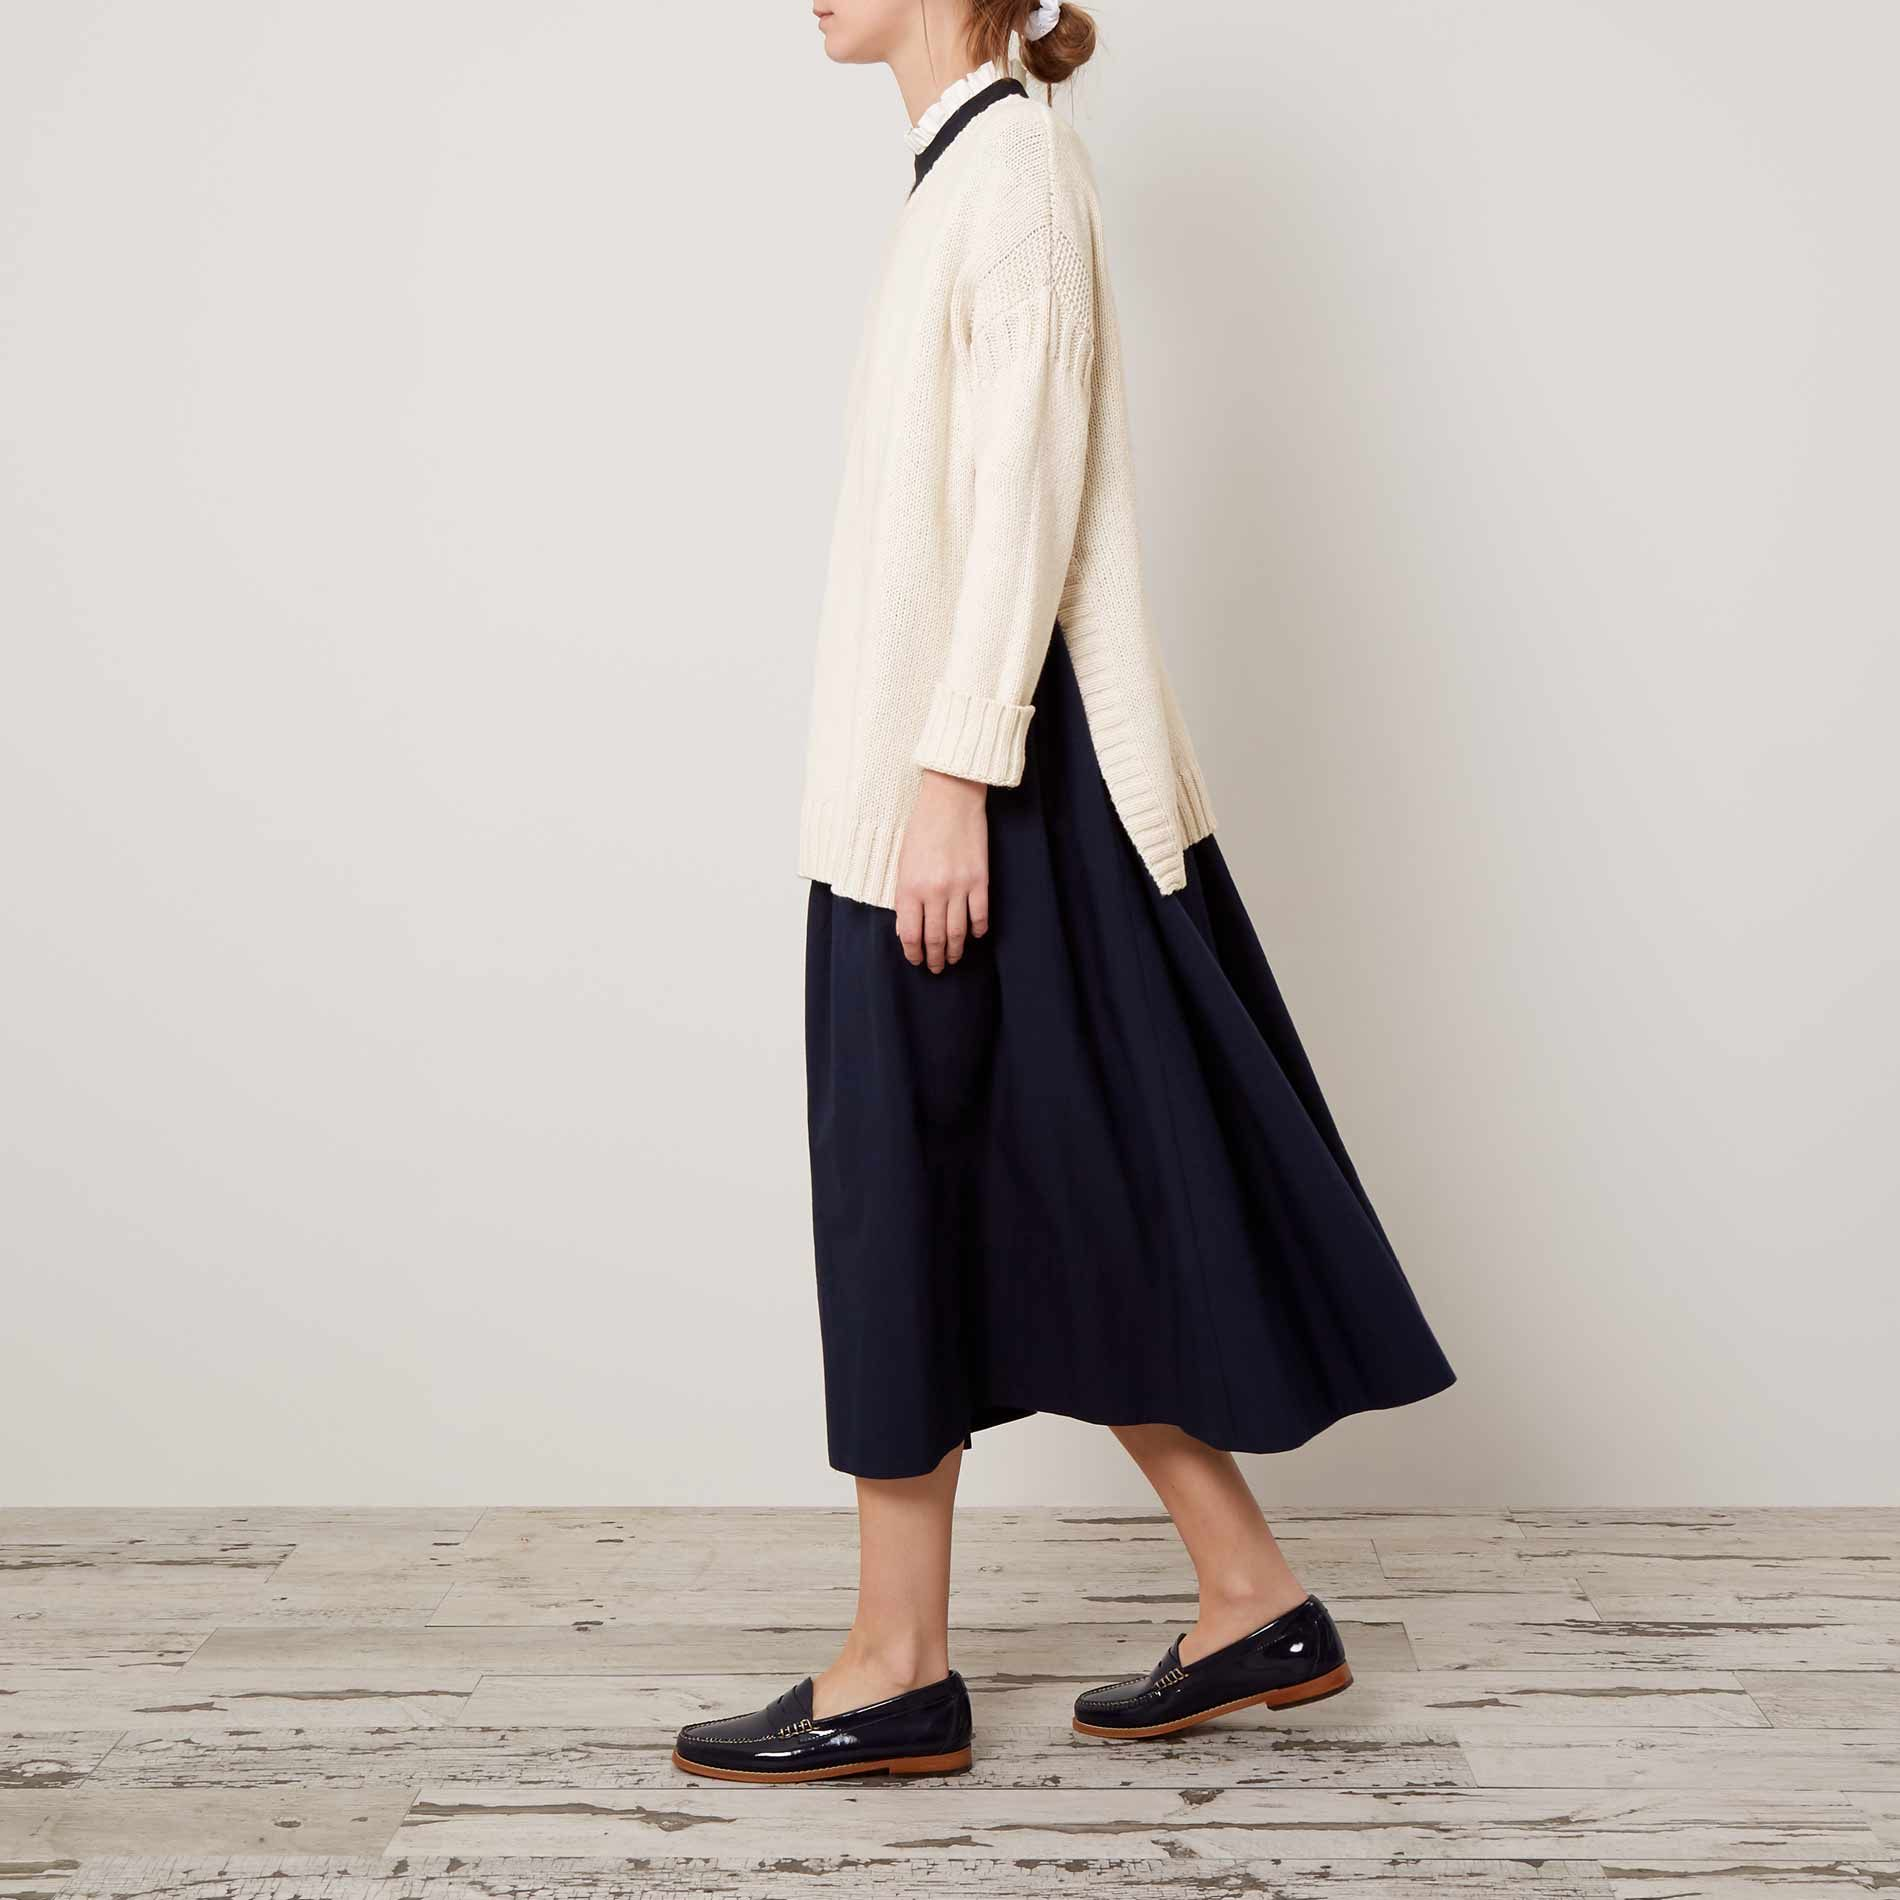 Warm White Netty Sweater | SS17 | Pinterest | British fashion ...